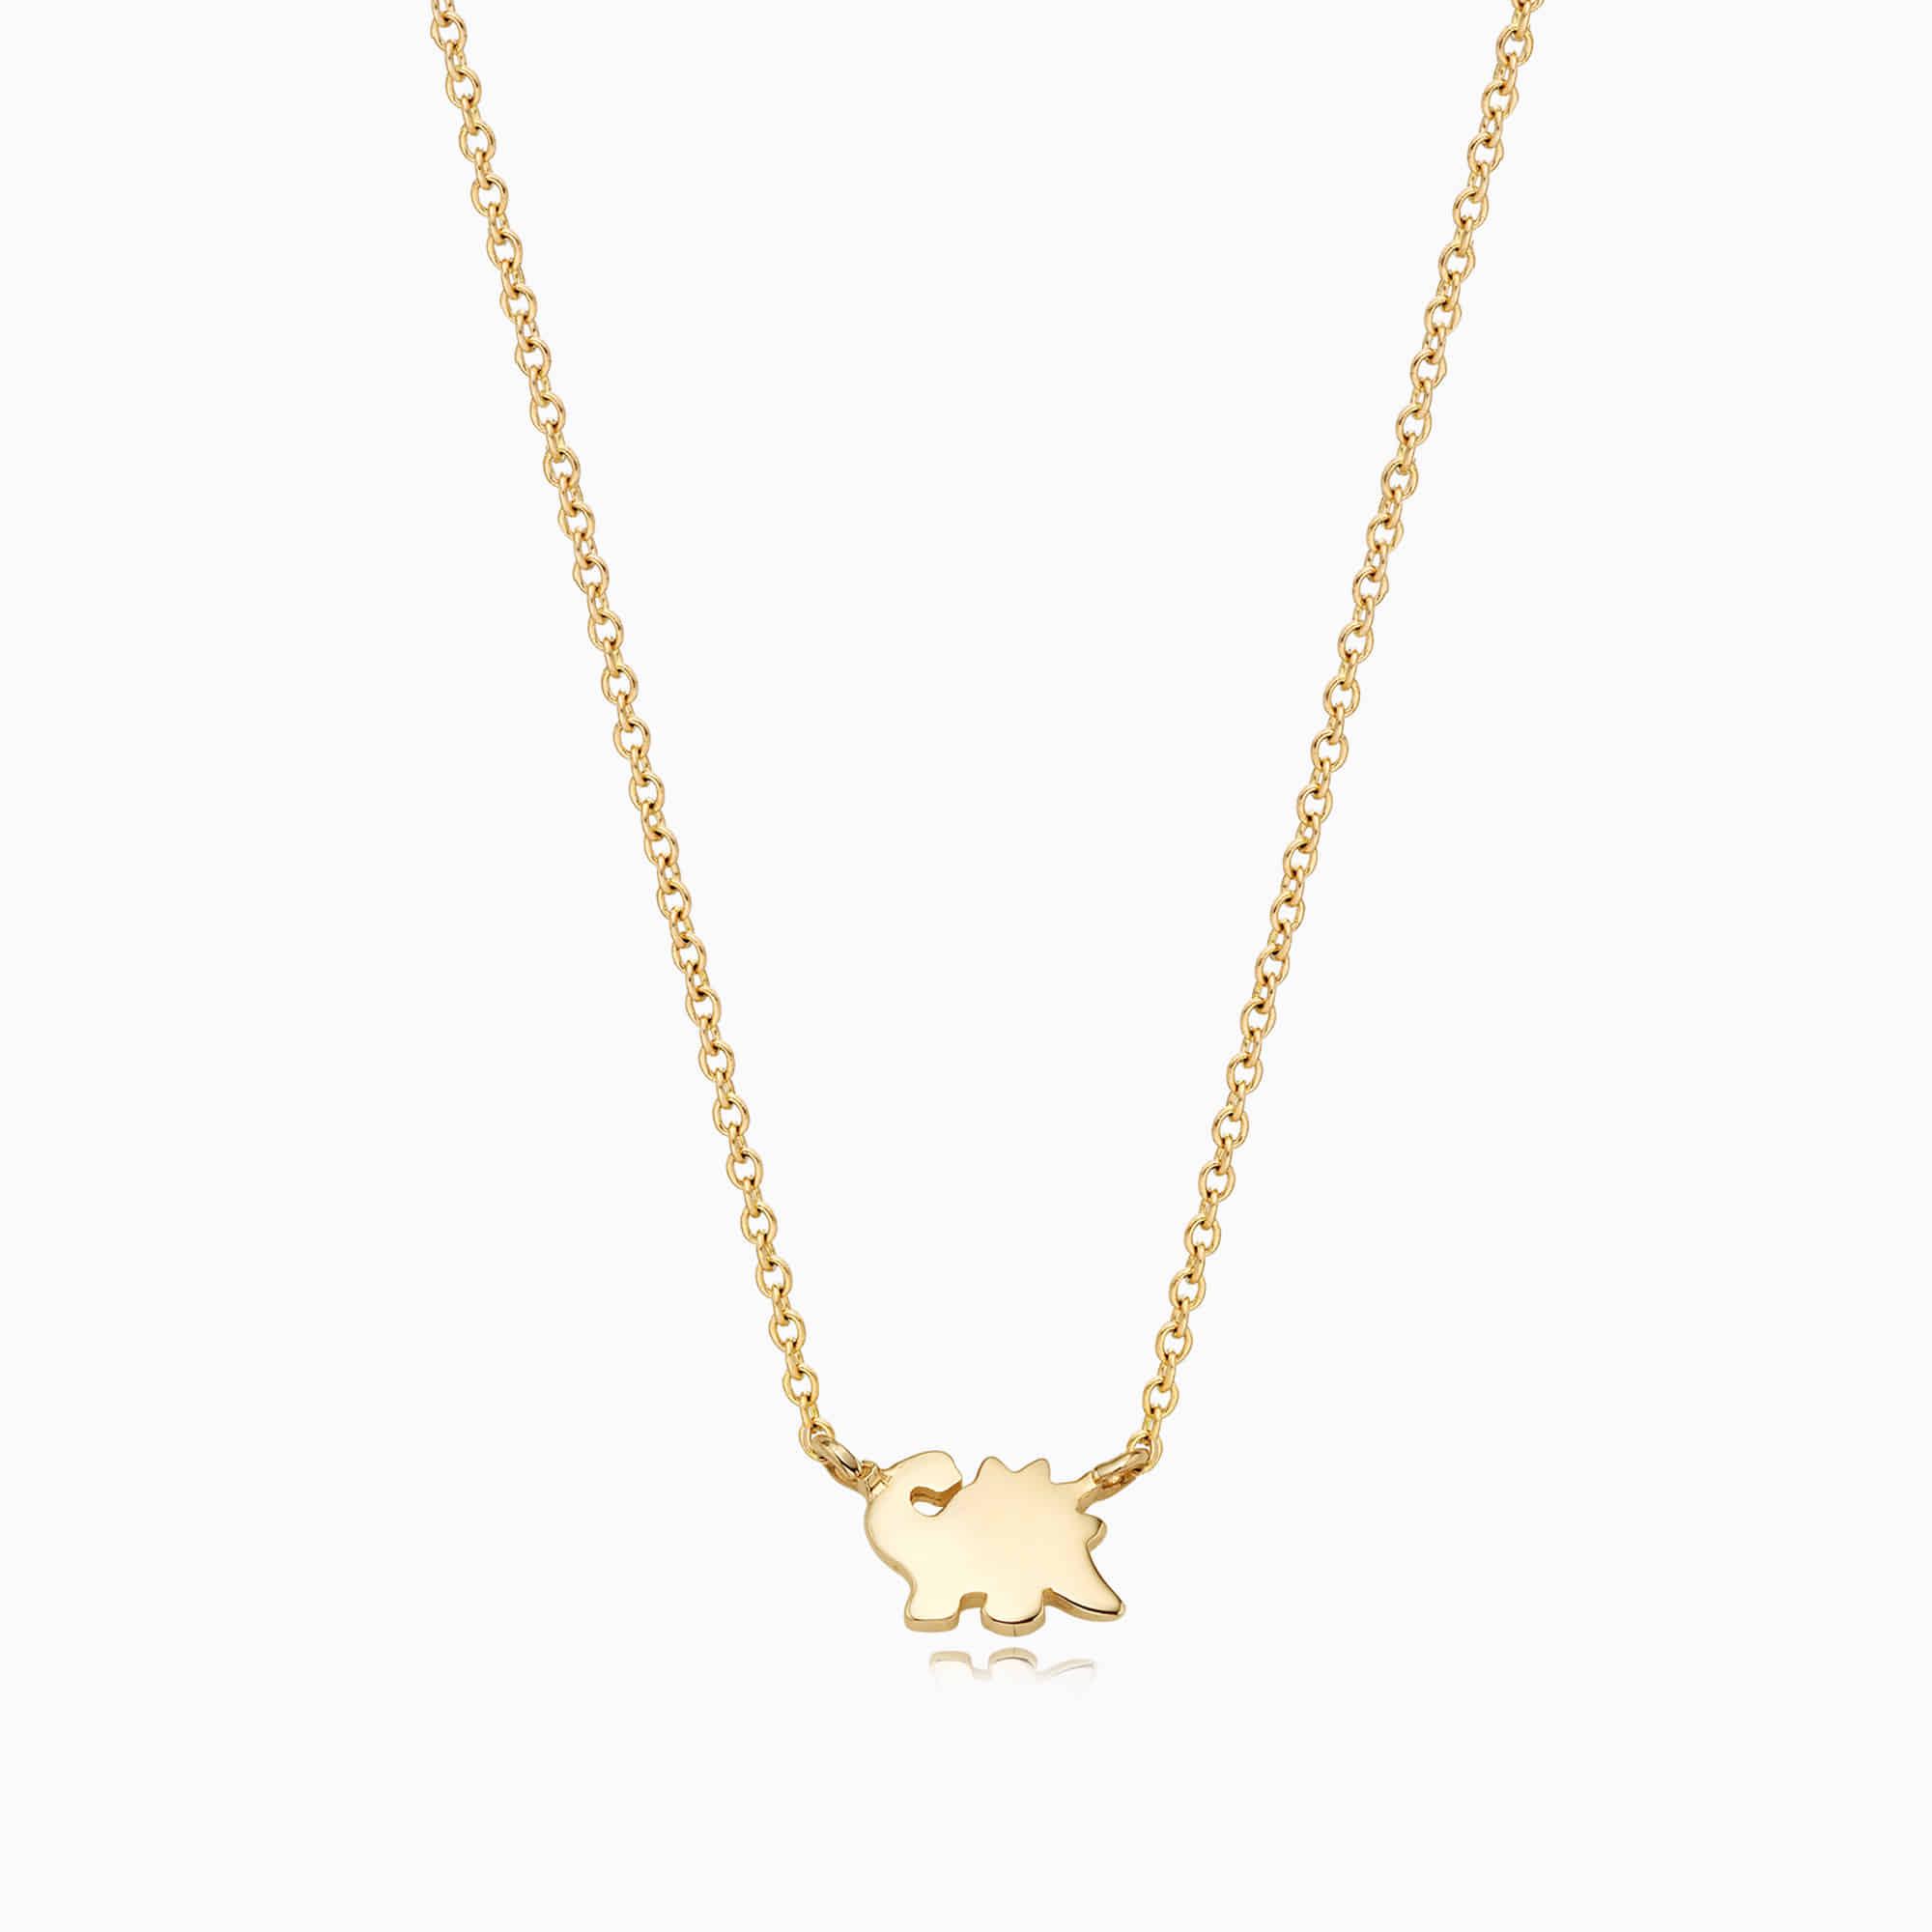 14K/18k Gold Simple Mini Dinosaur Necklace